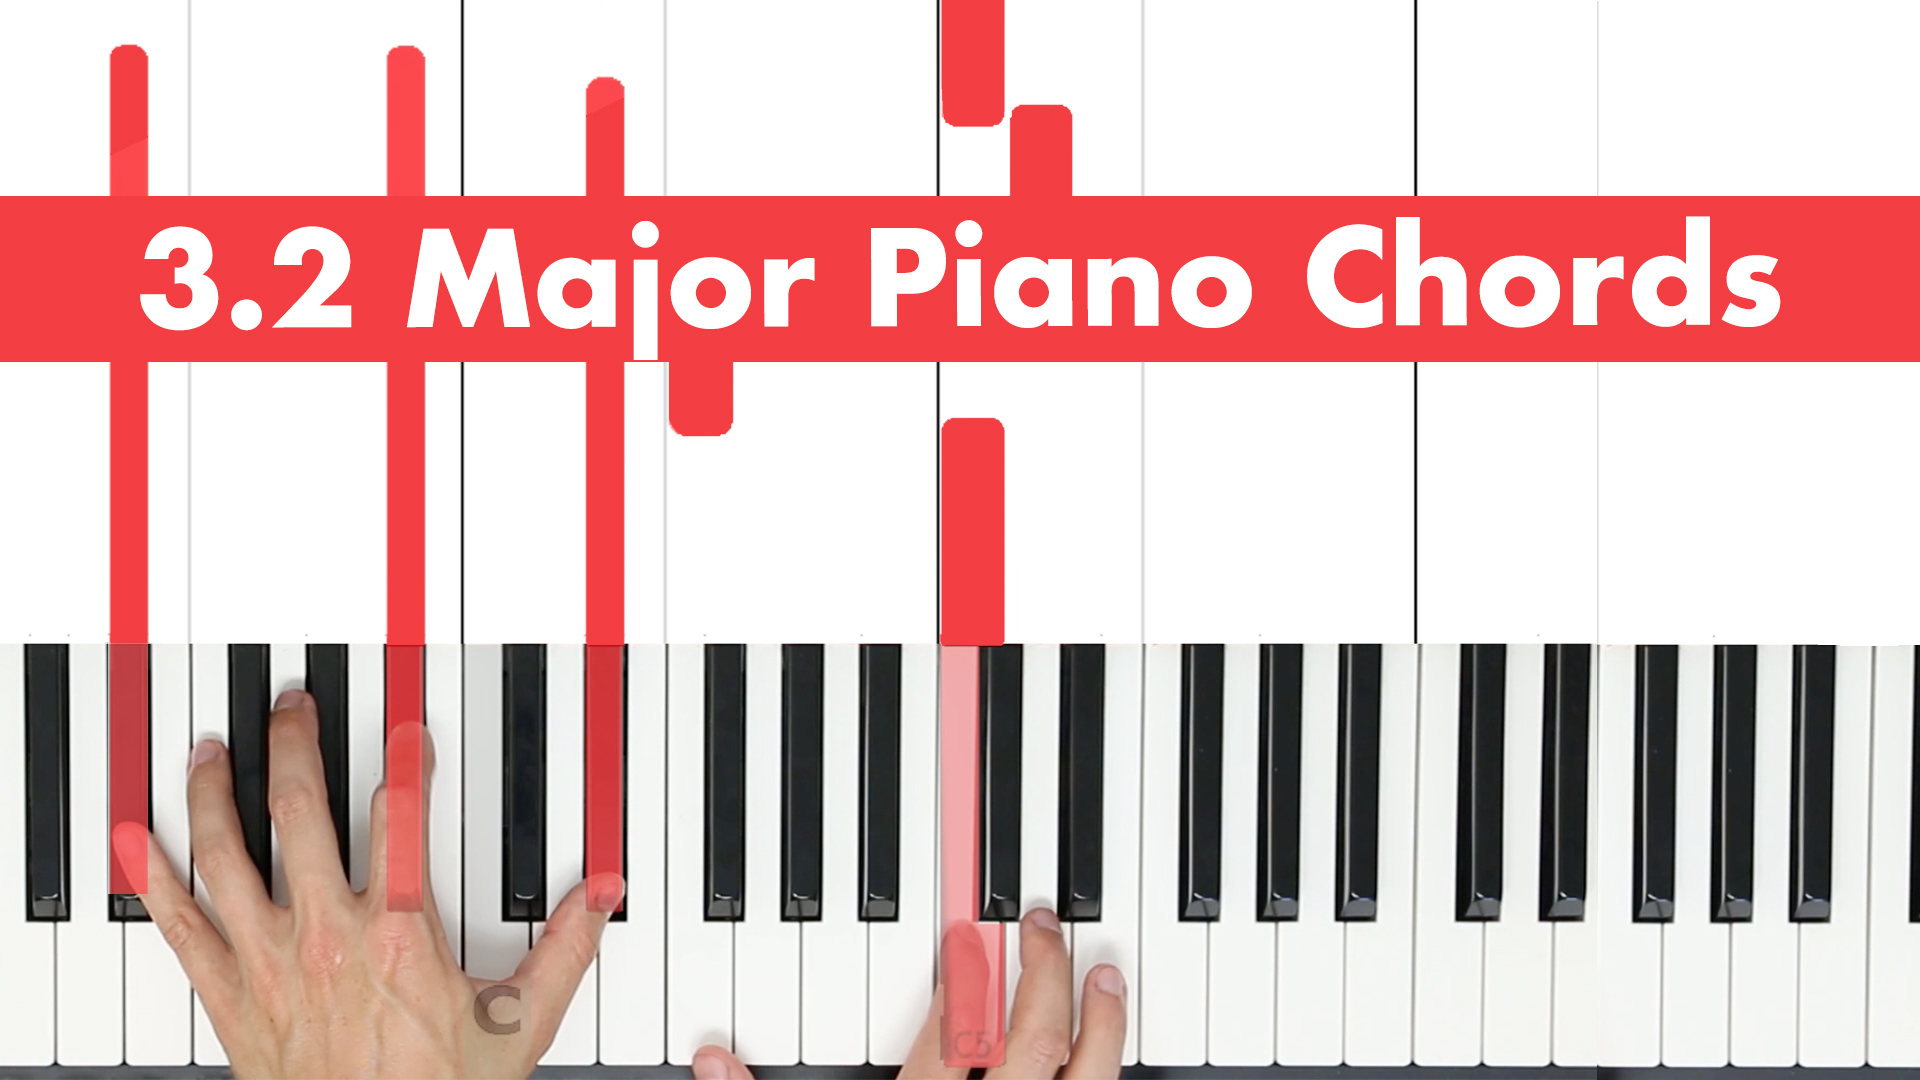 3.2 Major Chords